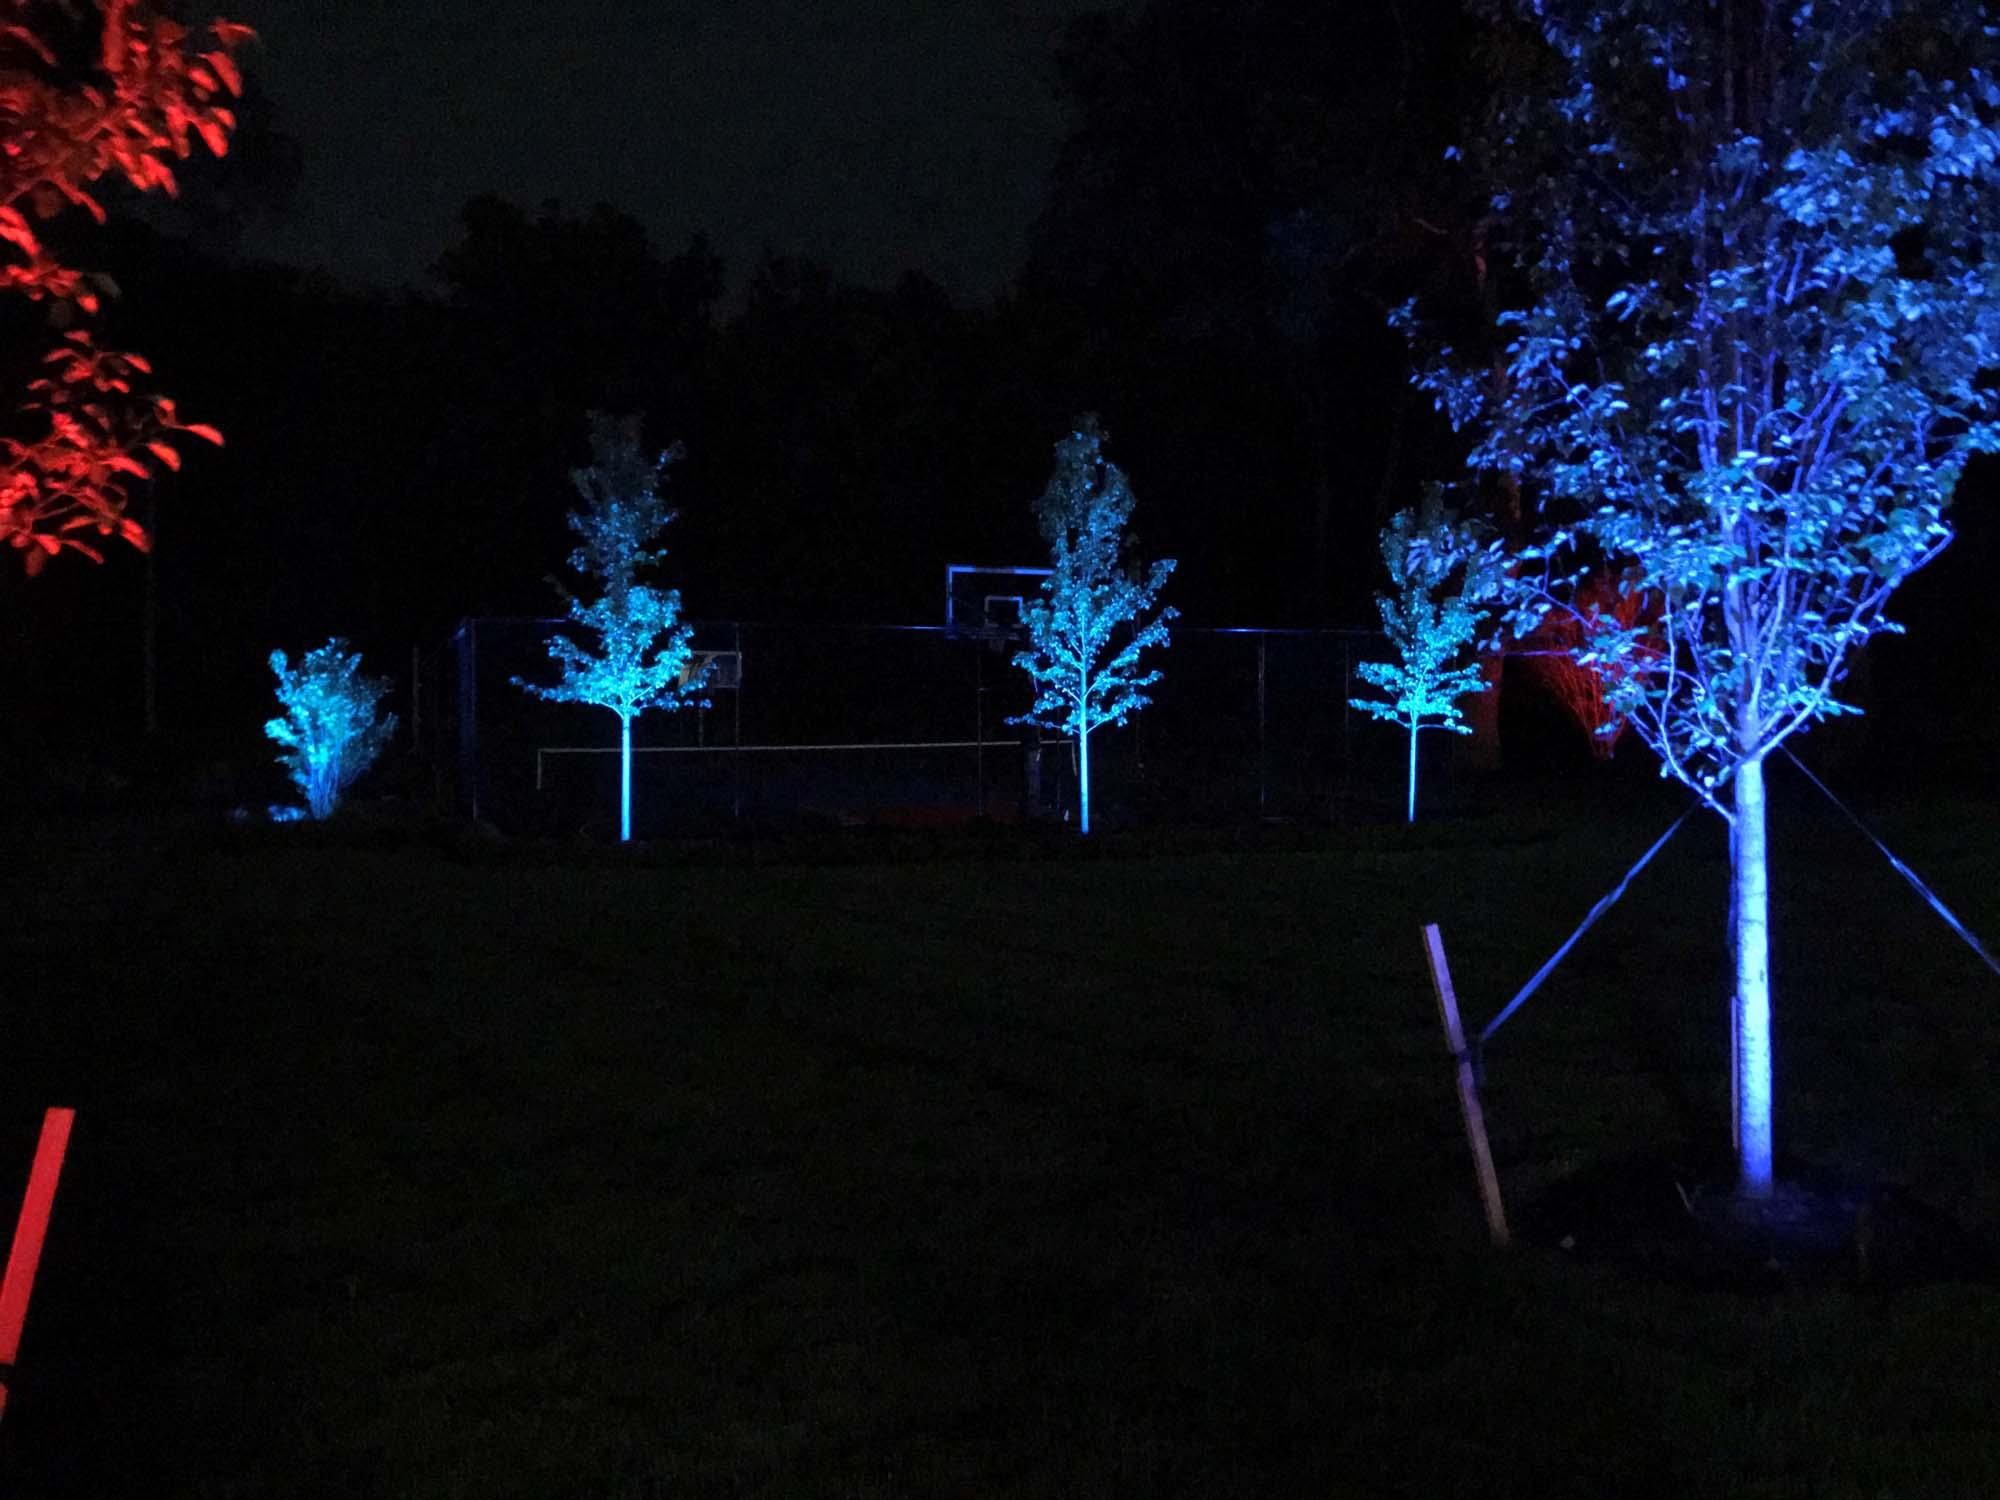 maddox color lighting pic 3